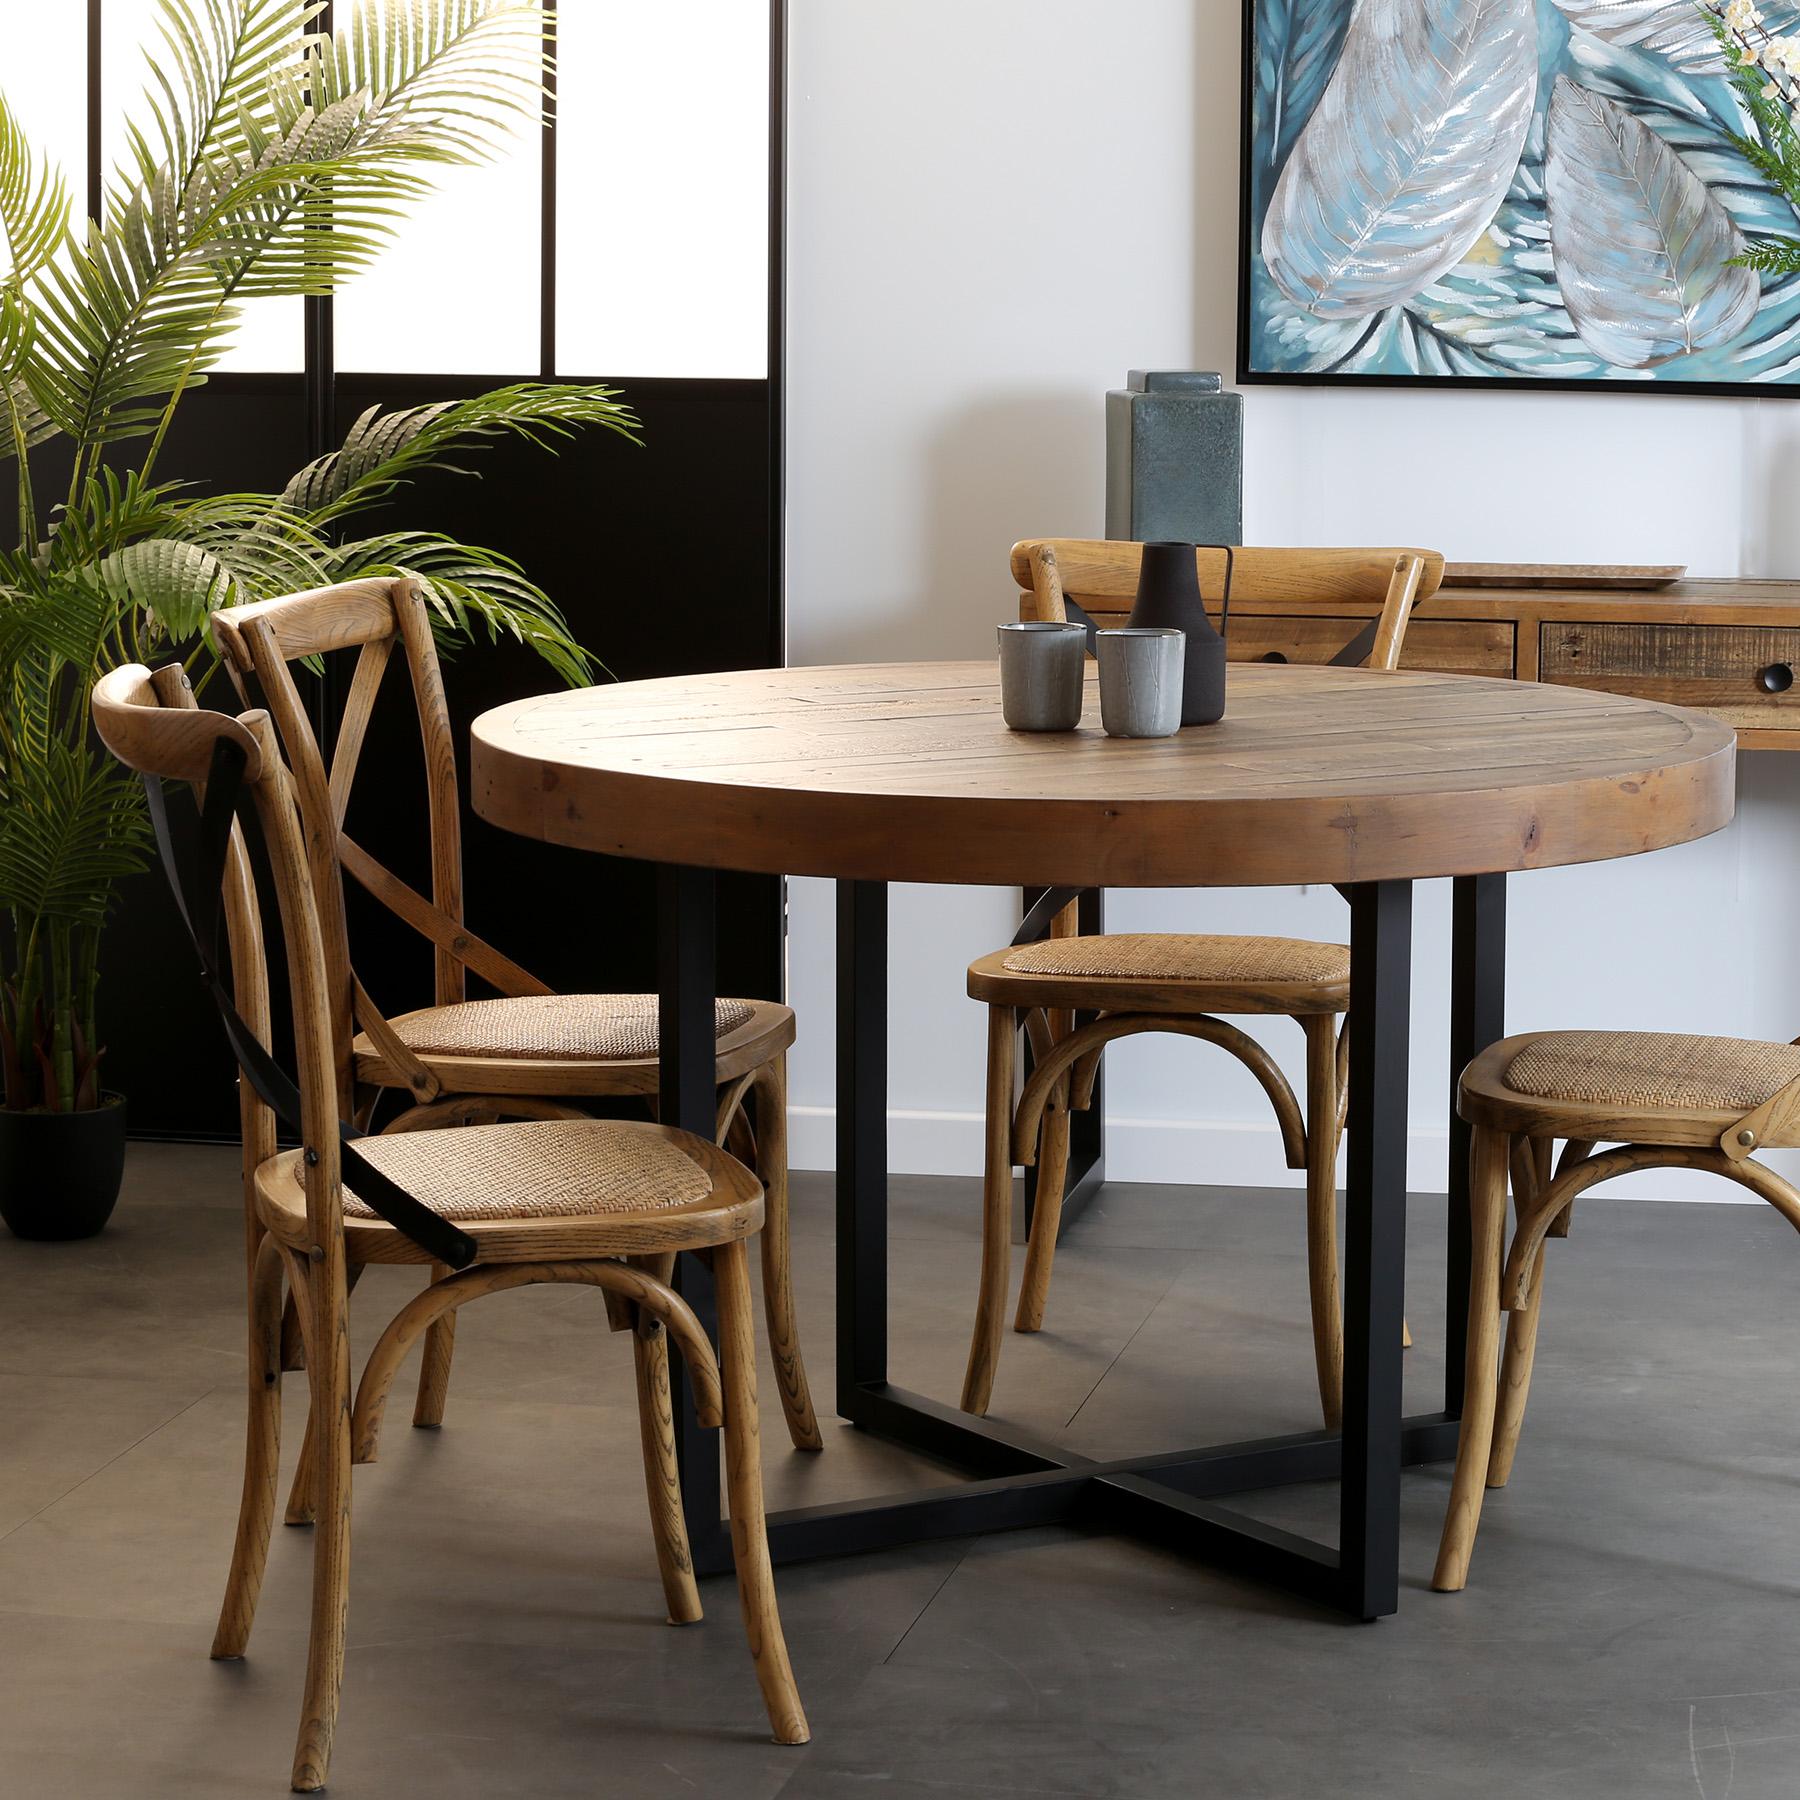 table a manger ronde bois recycle d120 brisbane